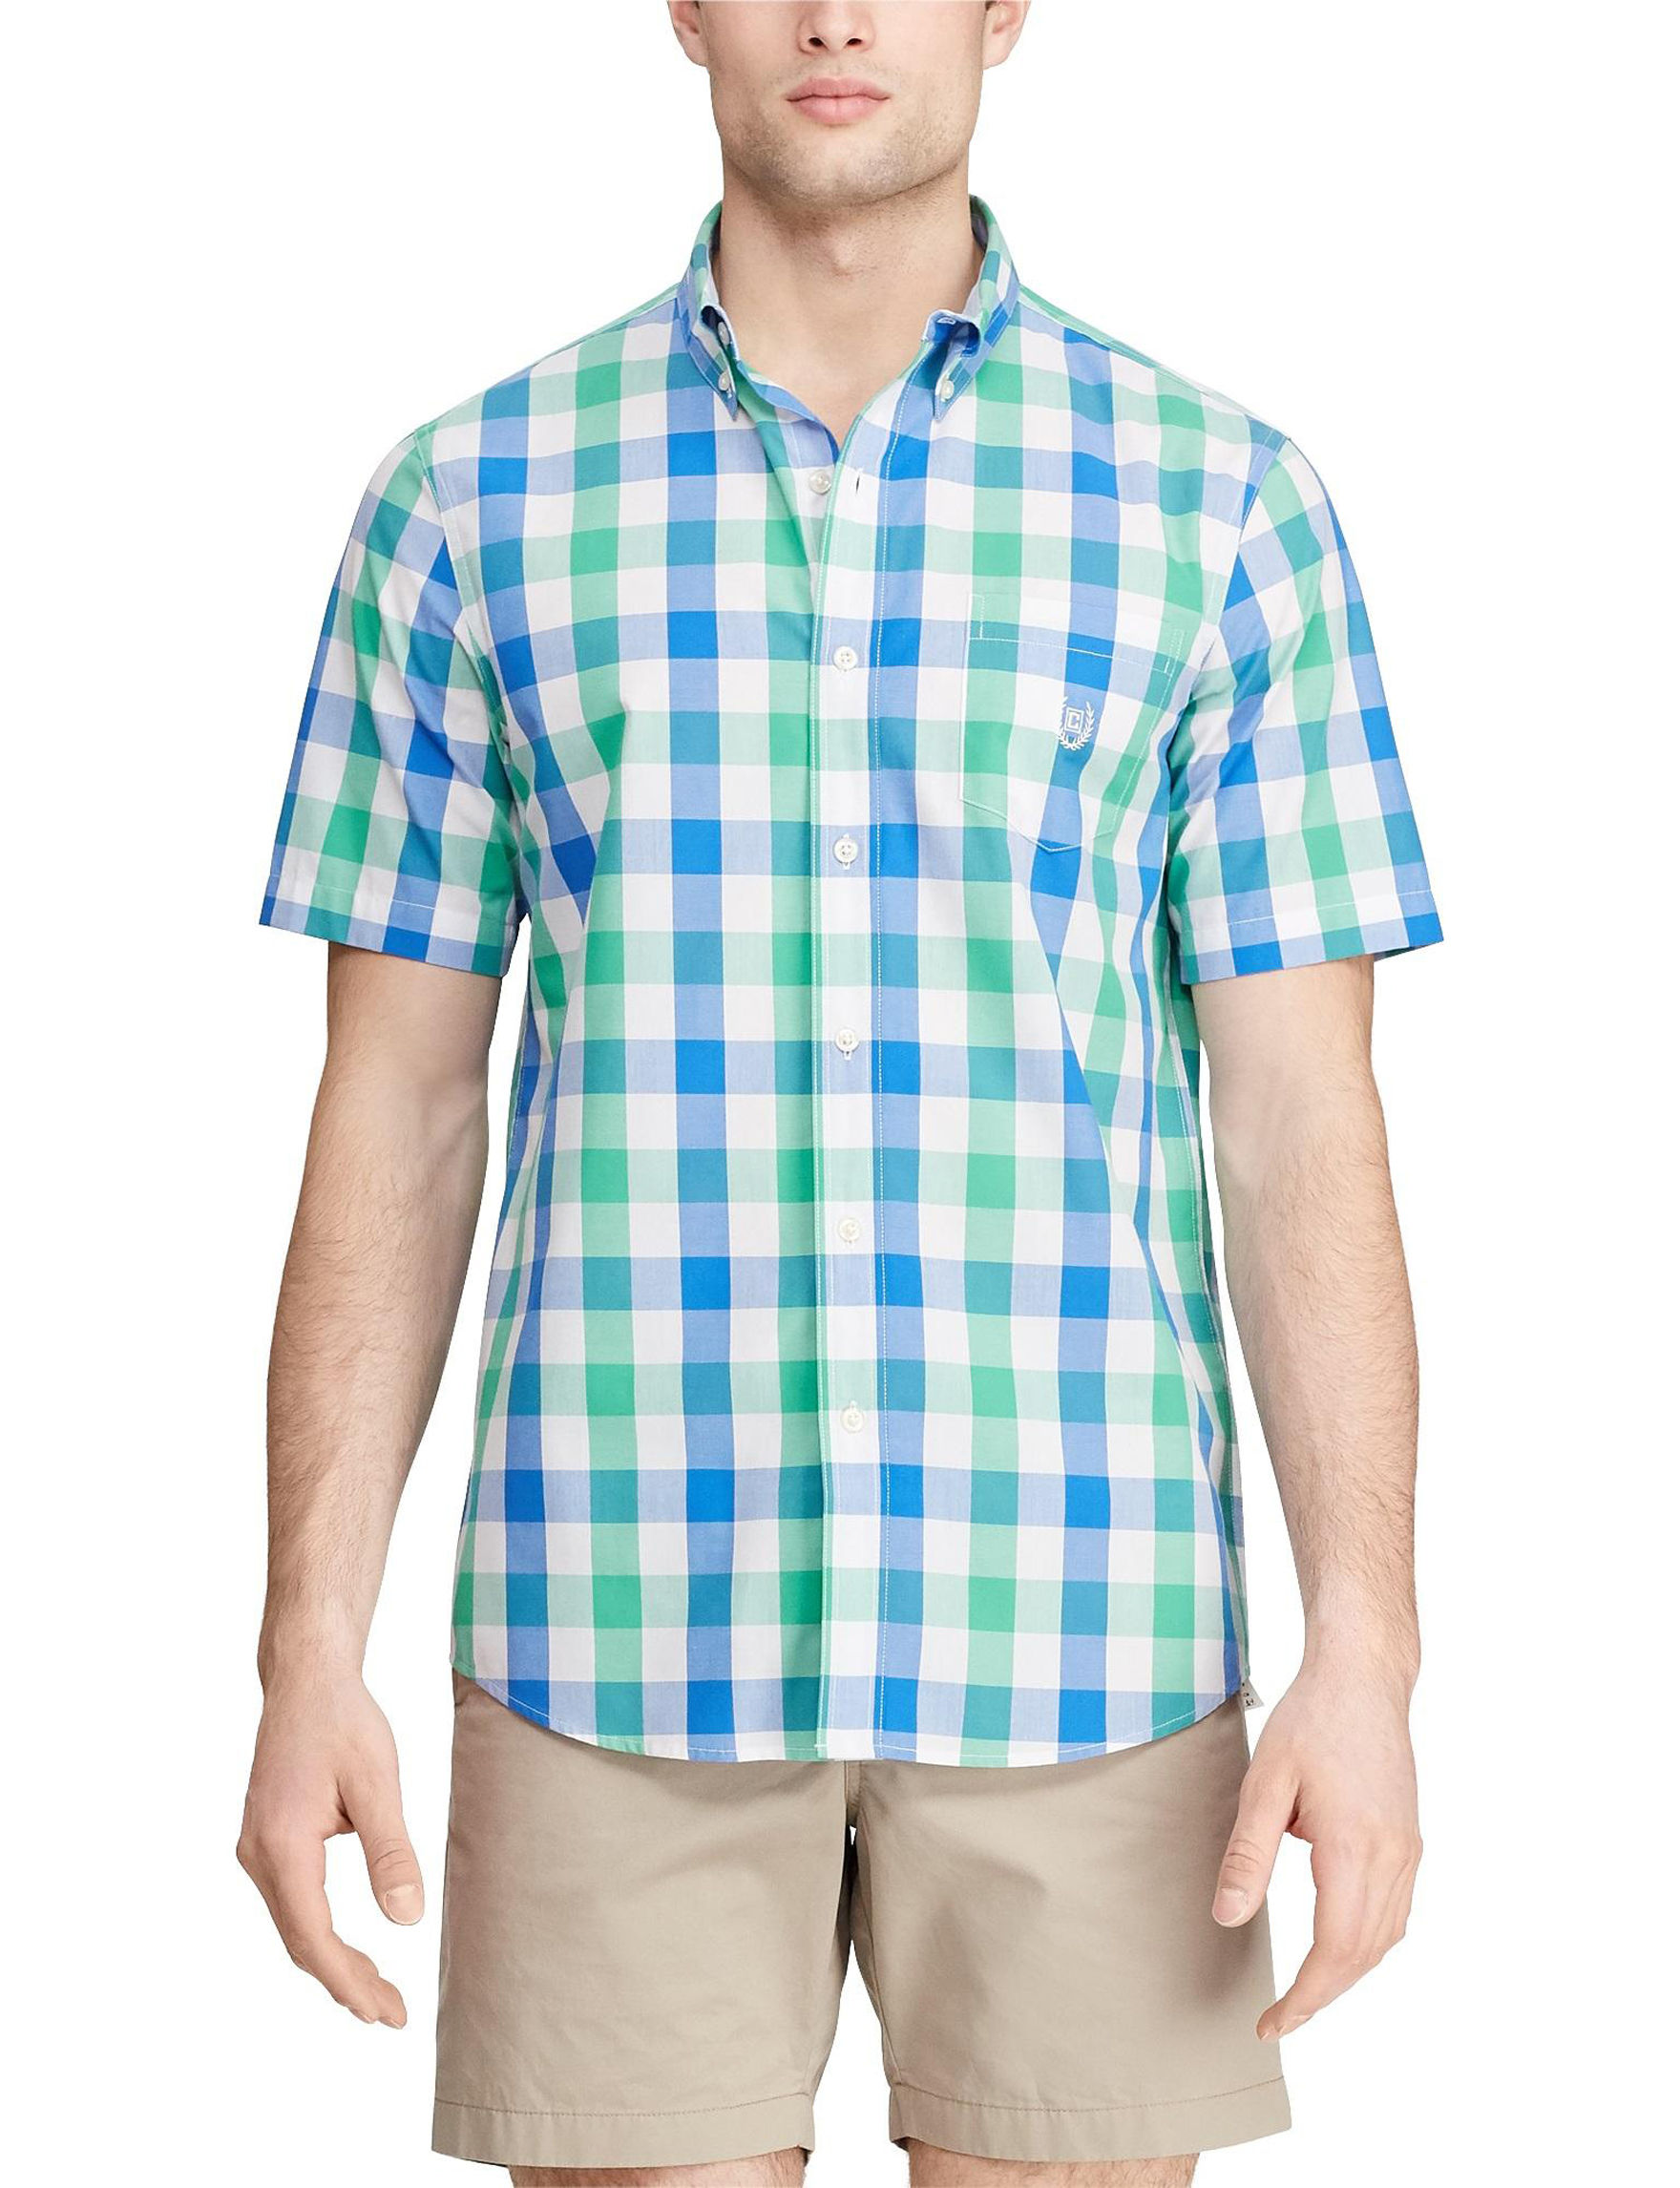 Chaps Plato Green Casual Button Down Shirts